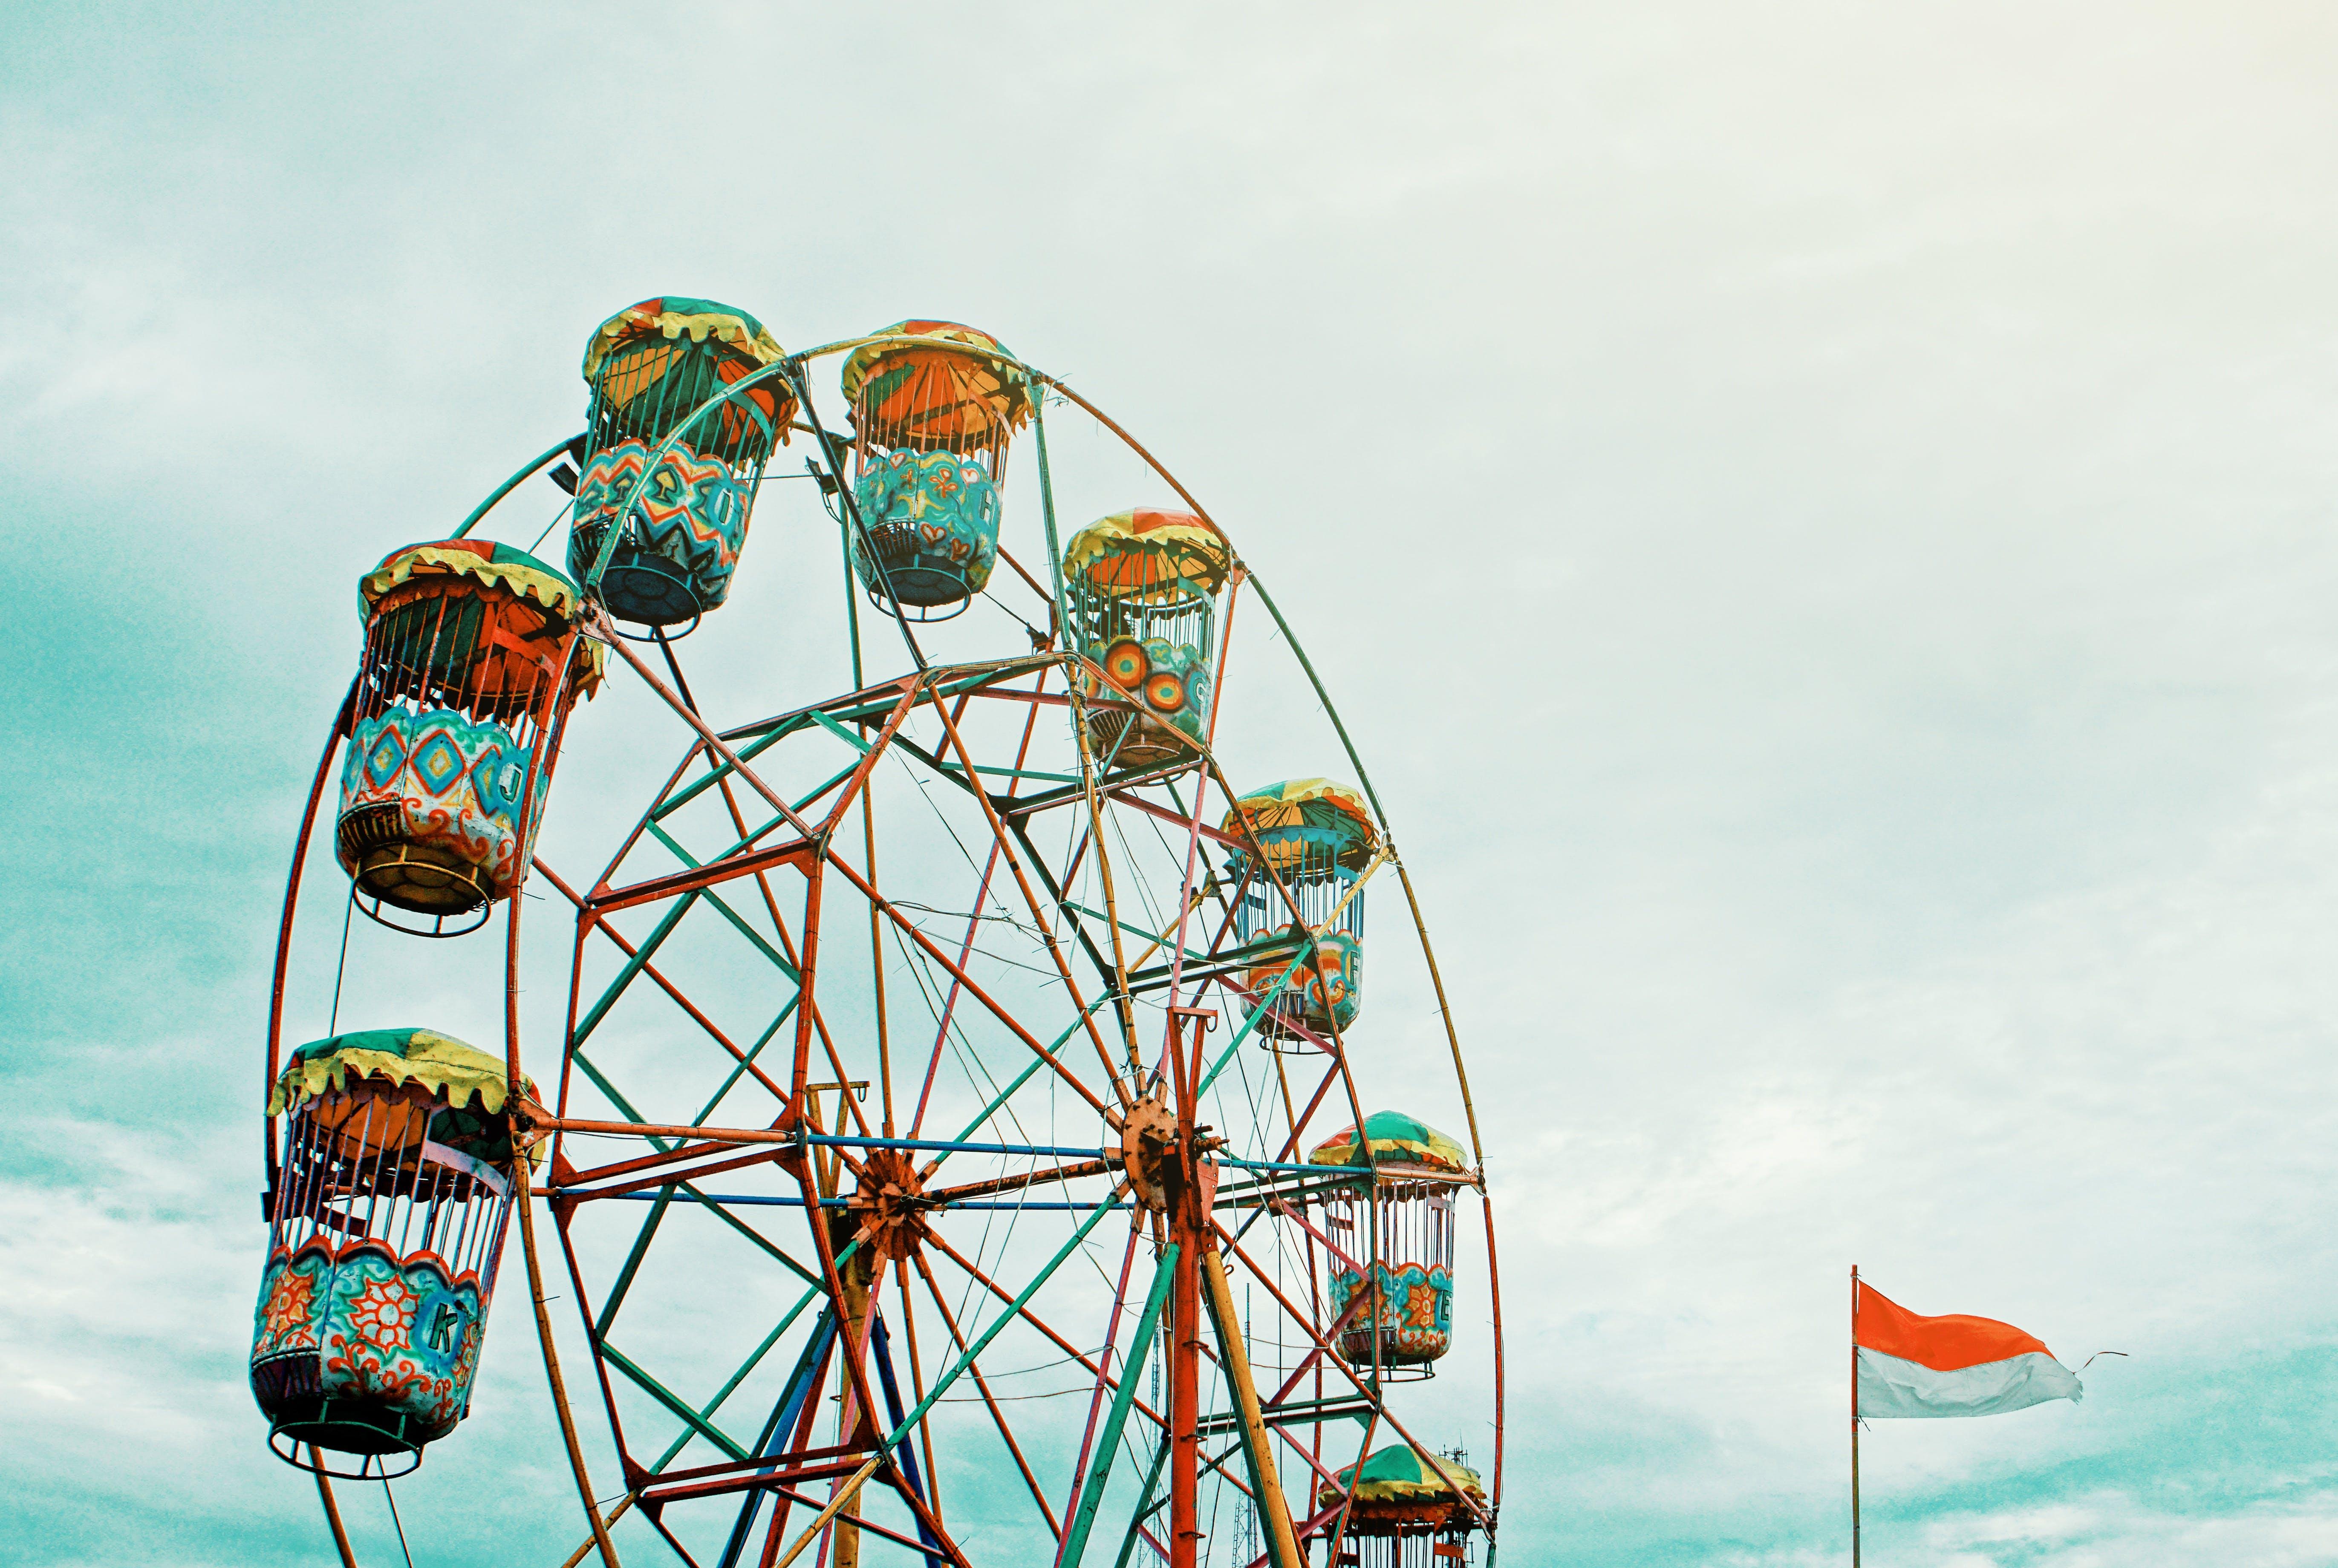 Photography of Orange Ferris Wheel Beside White and Orange Flag